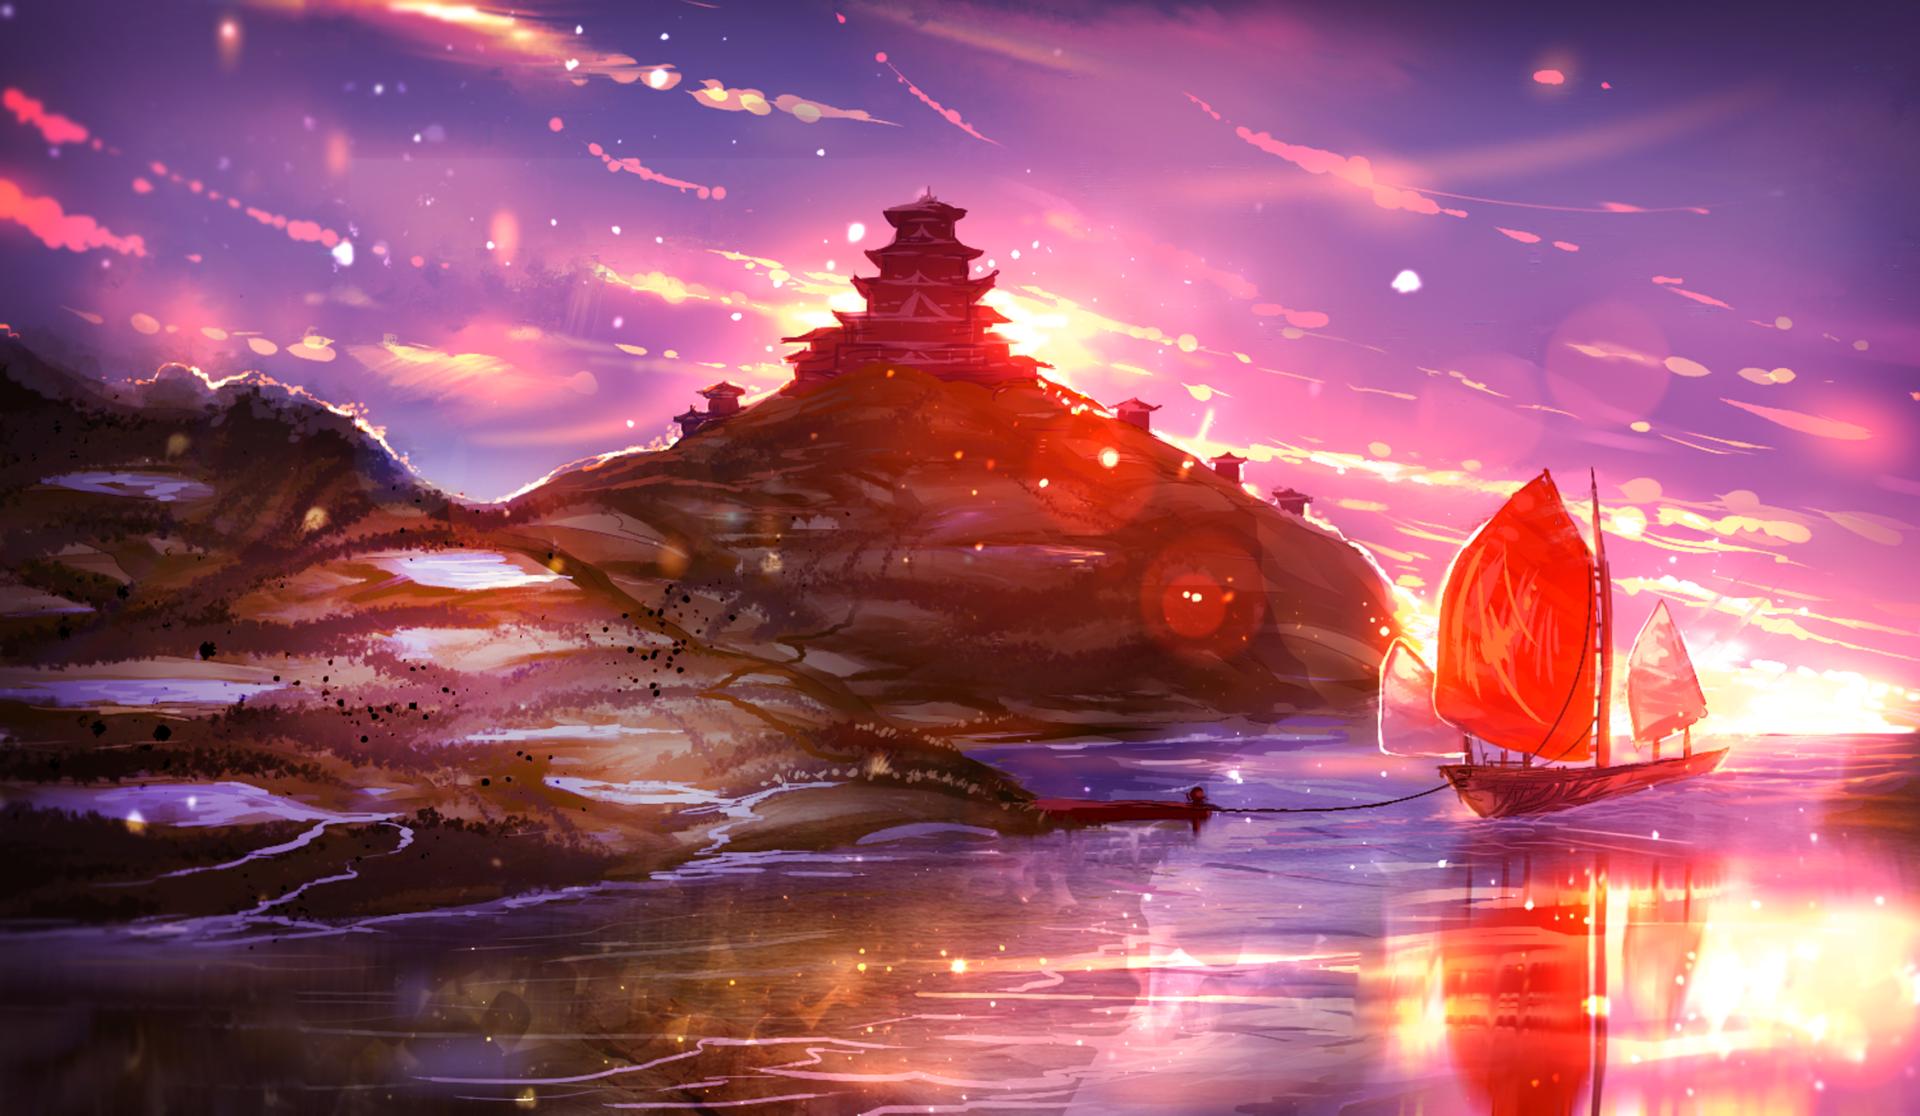 Anime Original Ship Sunset Sky Sea Shrine Wallpaper Desktop Wallpaper Art Wallpaper Pc Anime Art Inspiration Painting